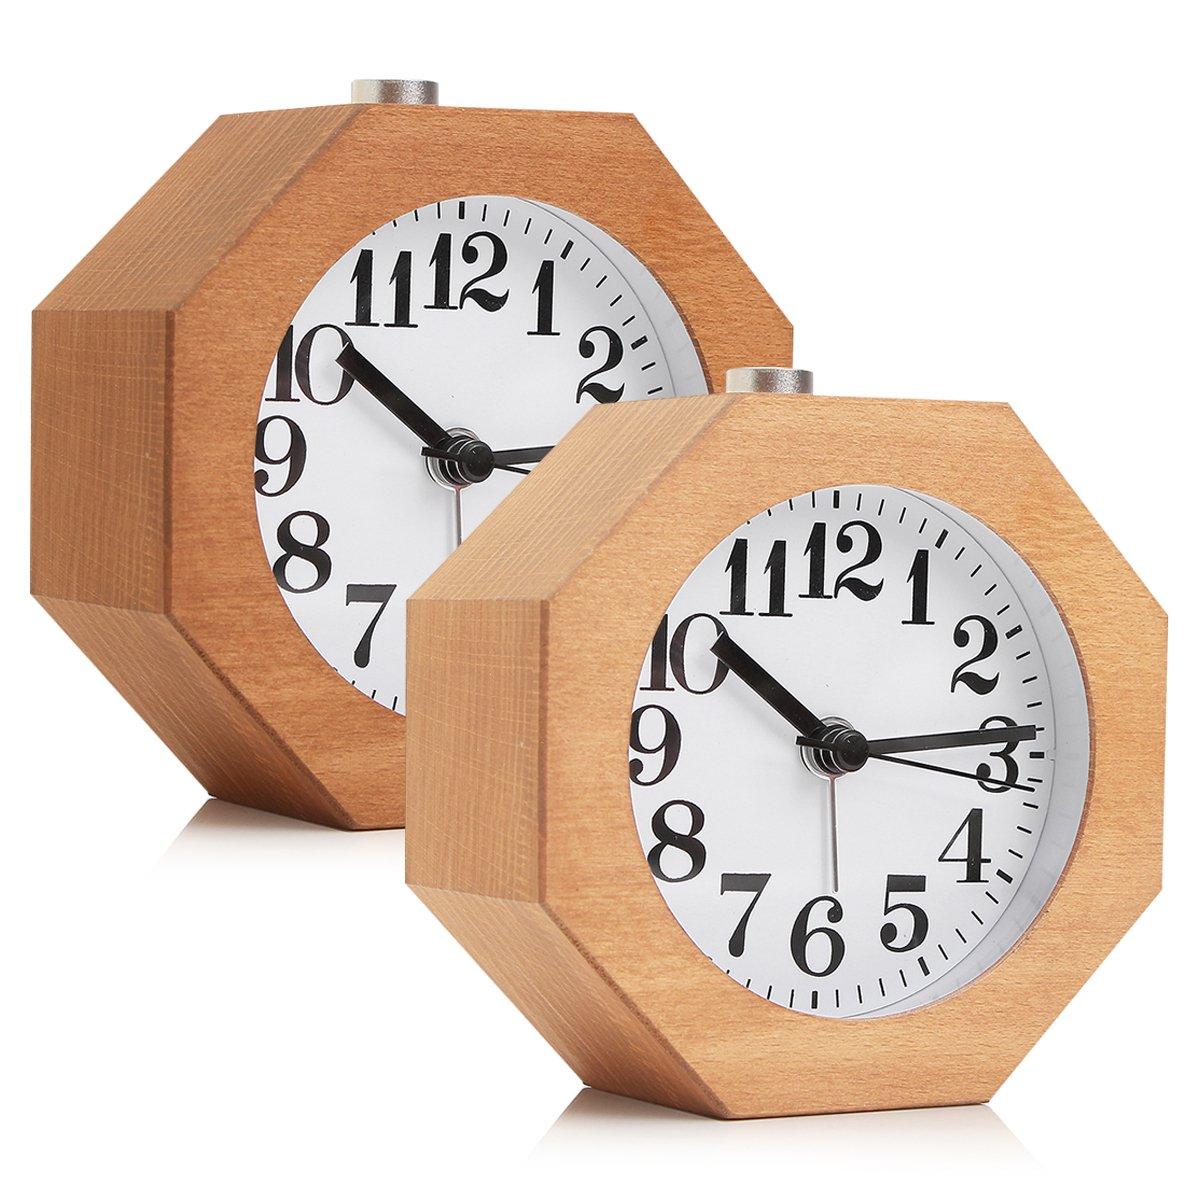 Baban Wooden Alarm Clock